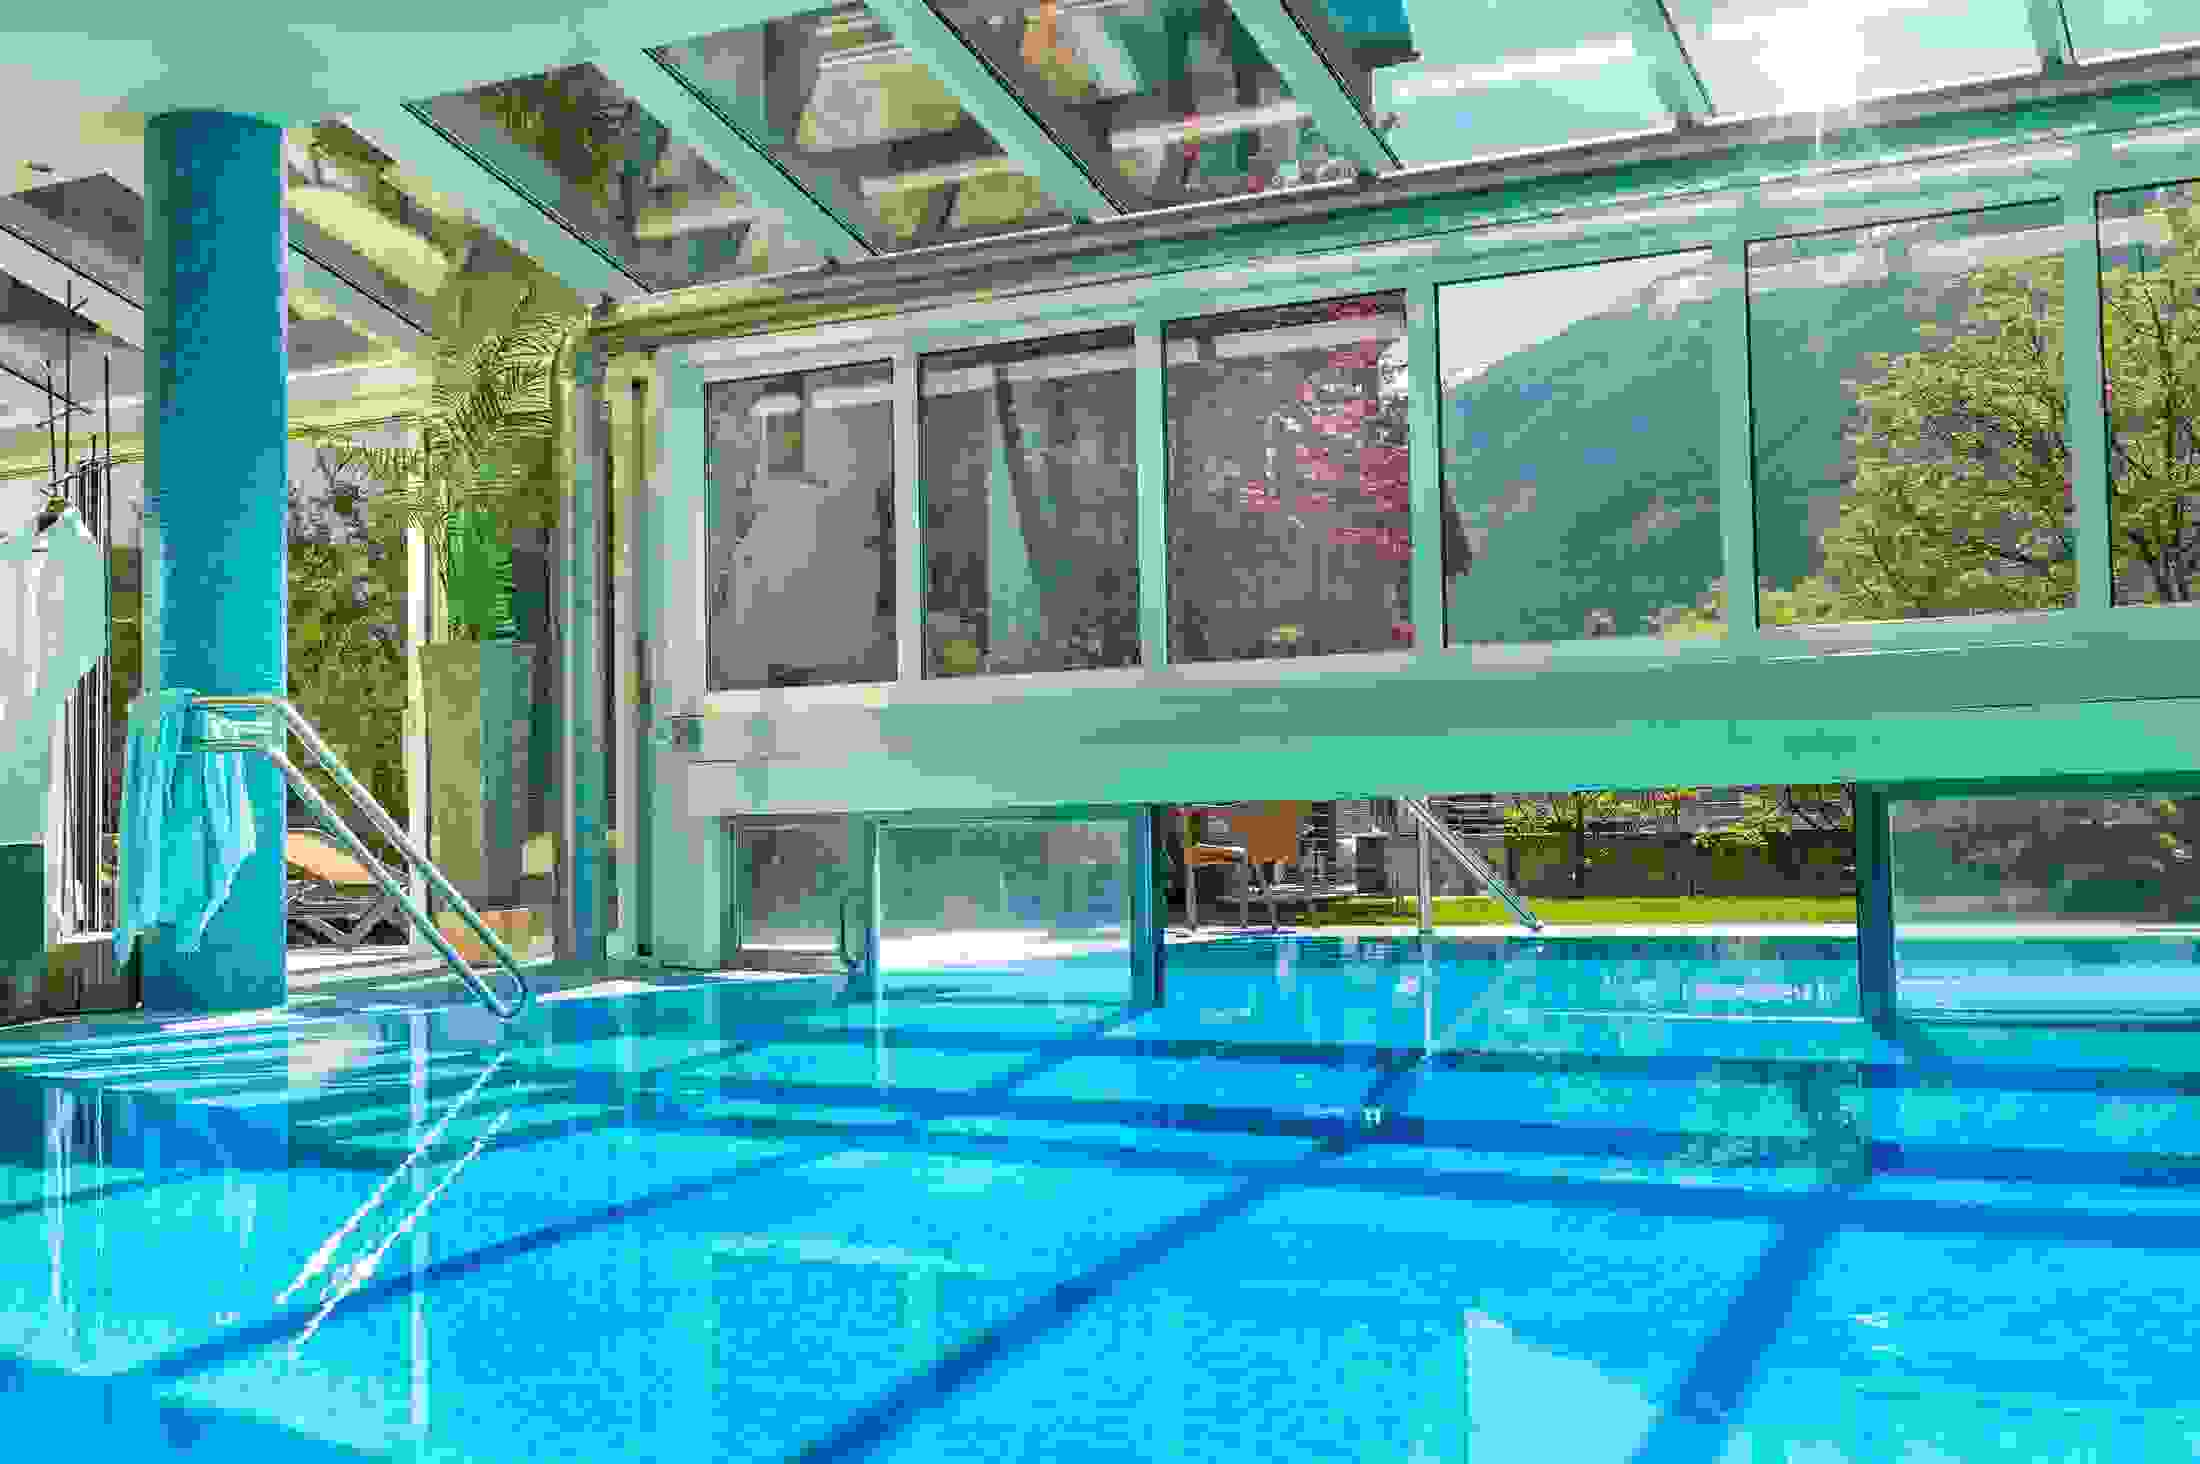 Appartamenti e residence con piscina e sauna in val venosta alto adige - Residence val badia con piscina ...